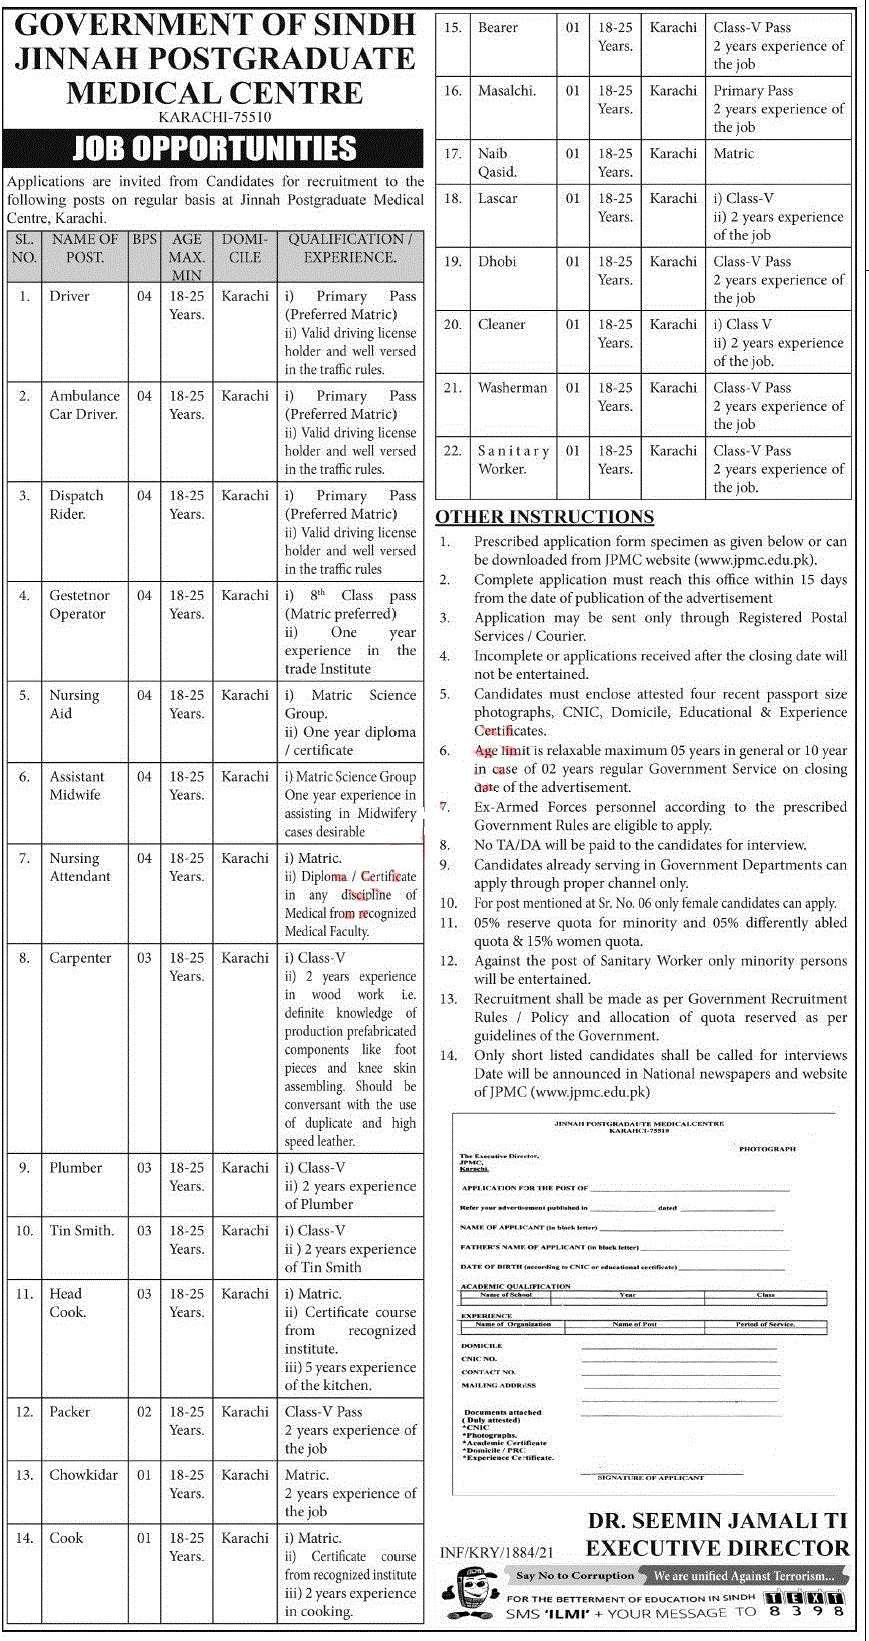 Jinnah Postgraduate Medical Centre JPMC Jobs 2021 for Driver, Ambulance Car Driver, Dispatch Rider and many more